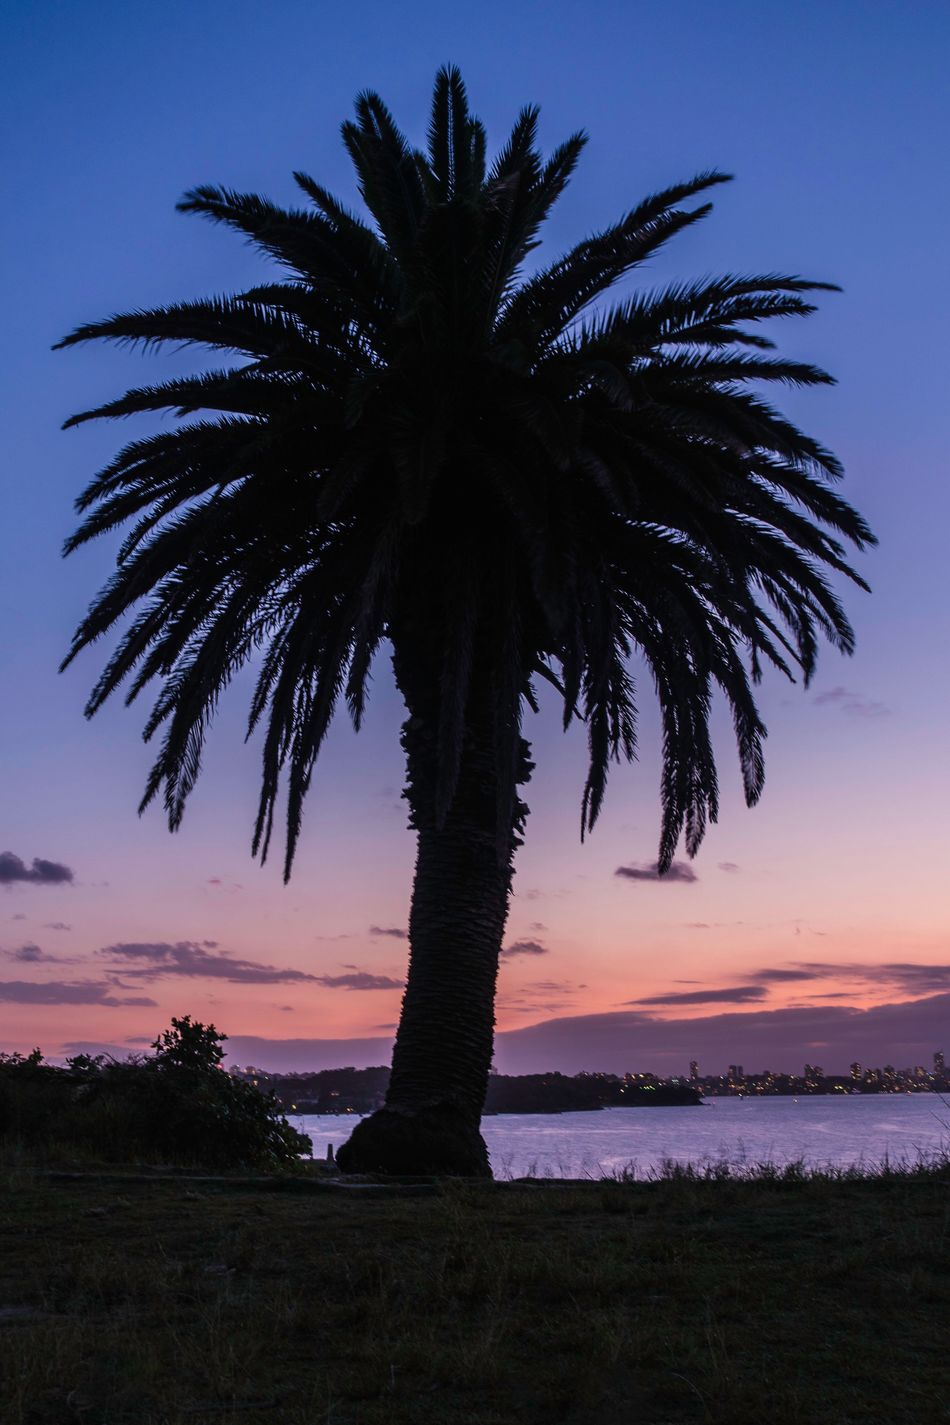 Tingle Tangle Palm Nature Scenics Silhouette Sunset No People Sky Tranquility Palm Tree Single Tree Beach